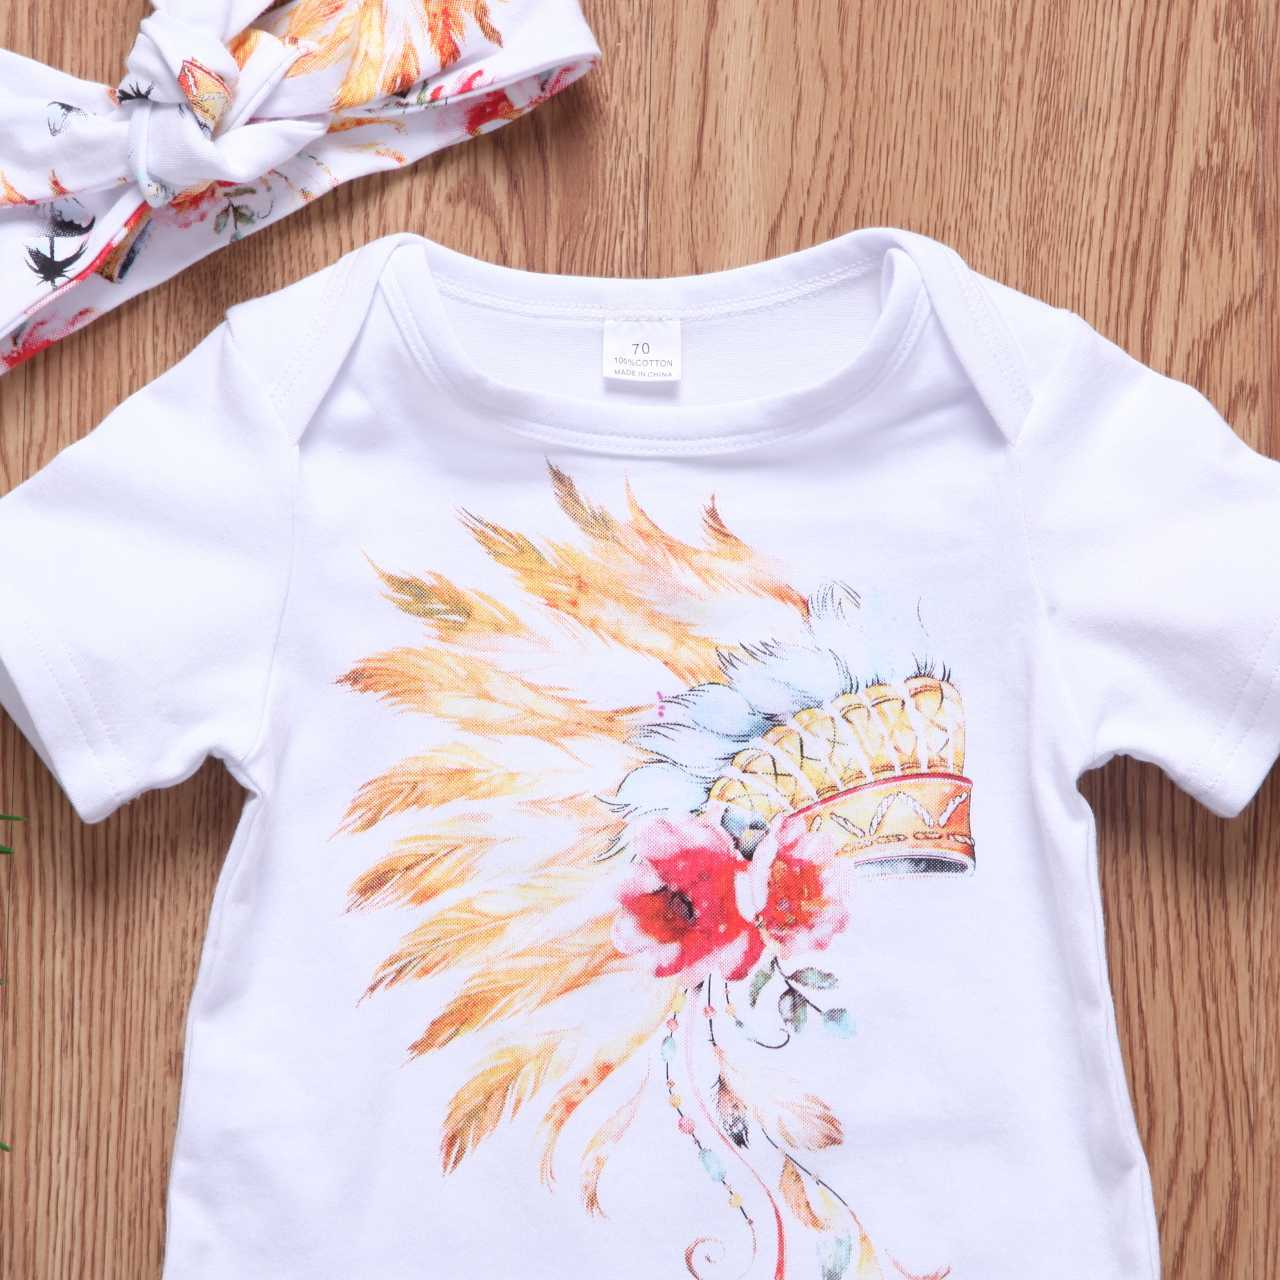 b514ba6713d58 ... Newborn Baby Boy Girls Gypsy Feather Outfits Clothes Tops + Shorts +Headband  3pcs Baby Clothing ...